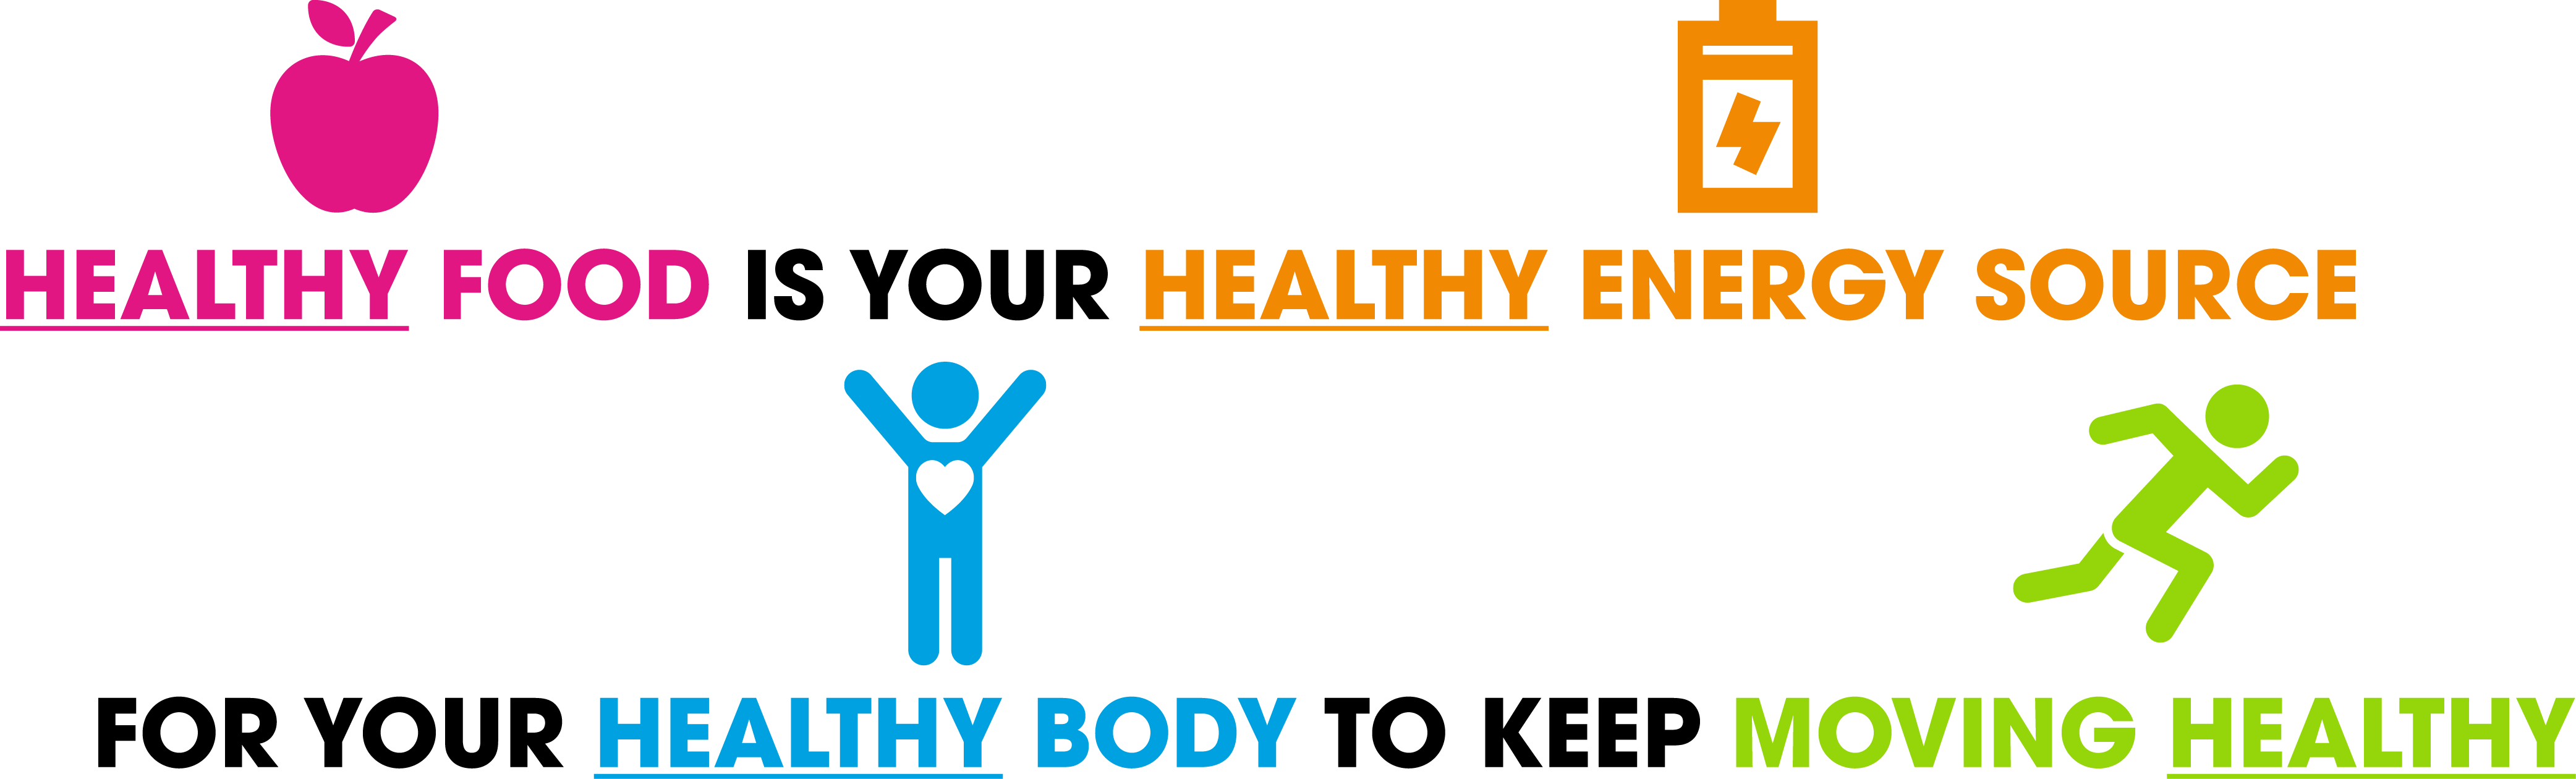 Y4PT NutriEnergy World Campaign